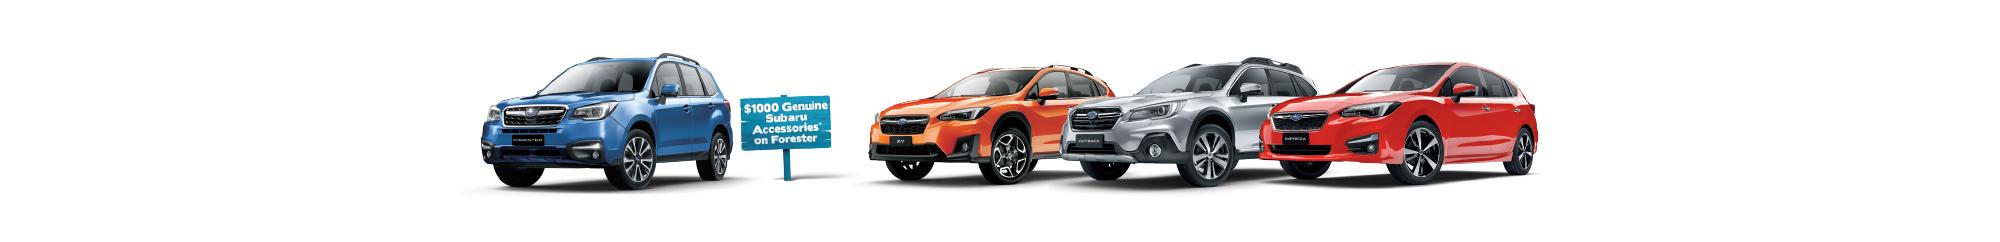 Bartons Capalaba Subaru 4 Day Sale